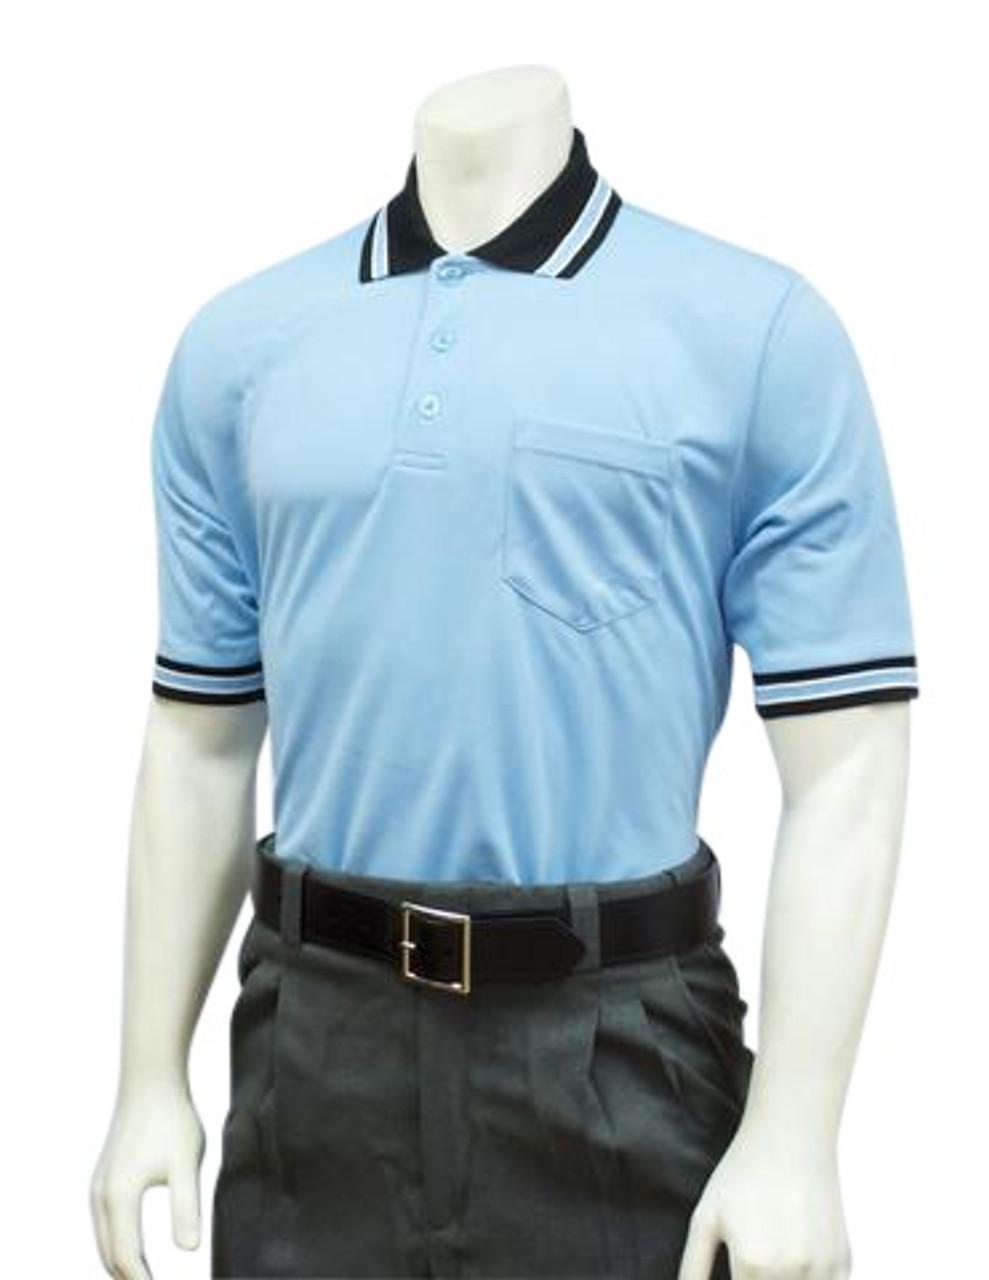 Black With Powder Blue /& White Trim Major League Umpire Jacket